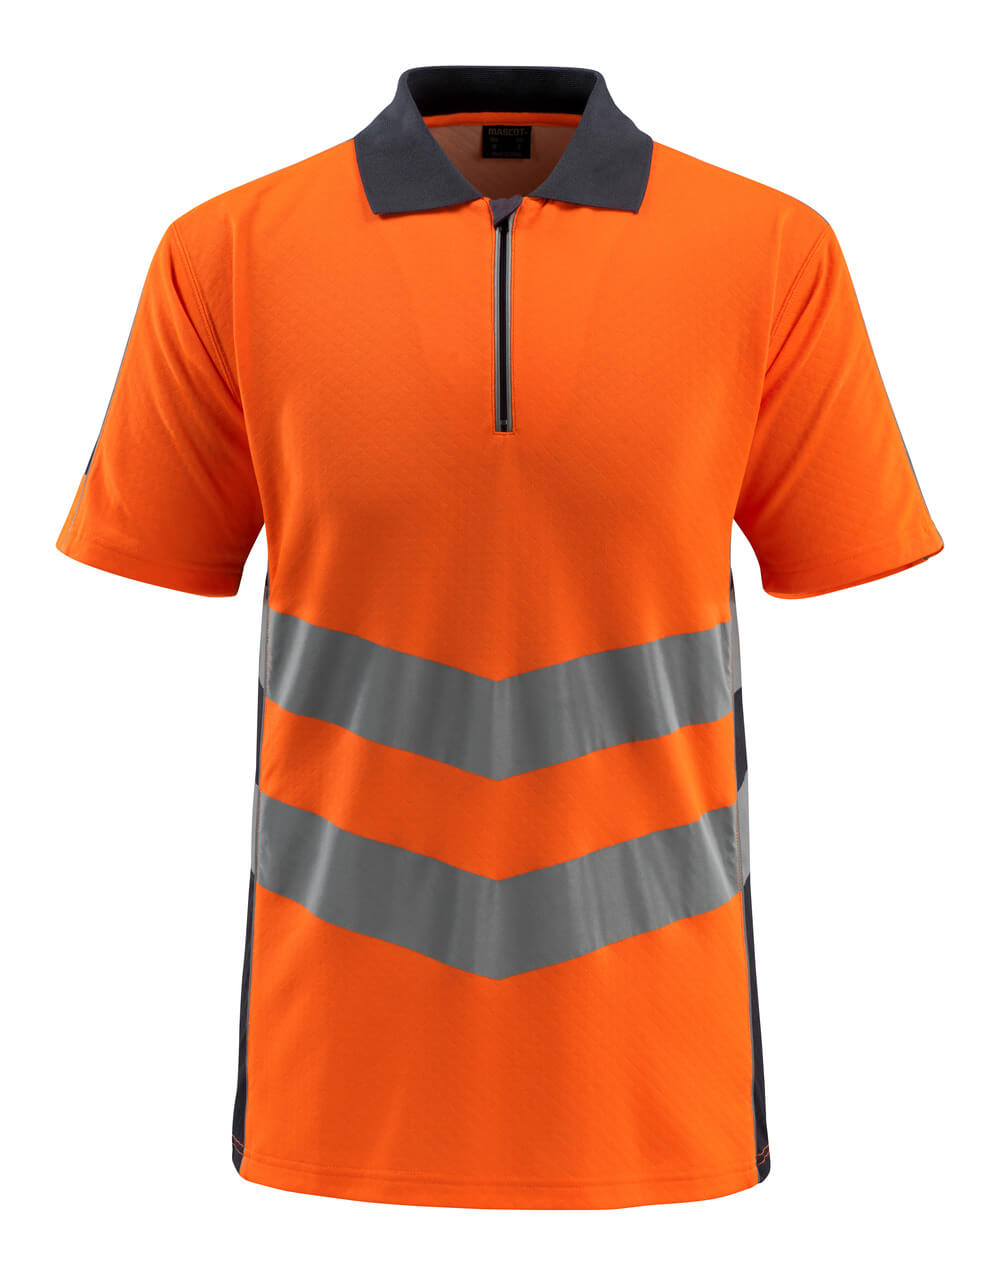 50130-933-14010 Polo - Hi-vis orange/Marine foncé